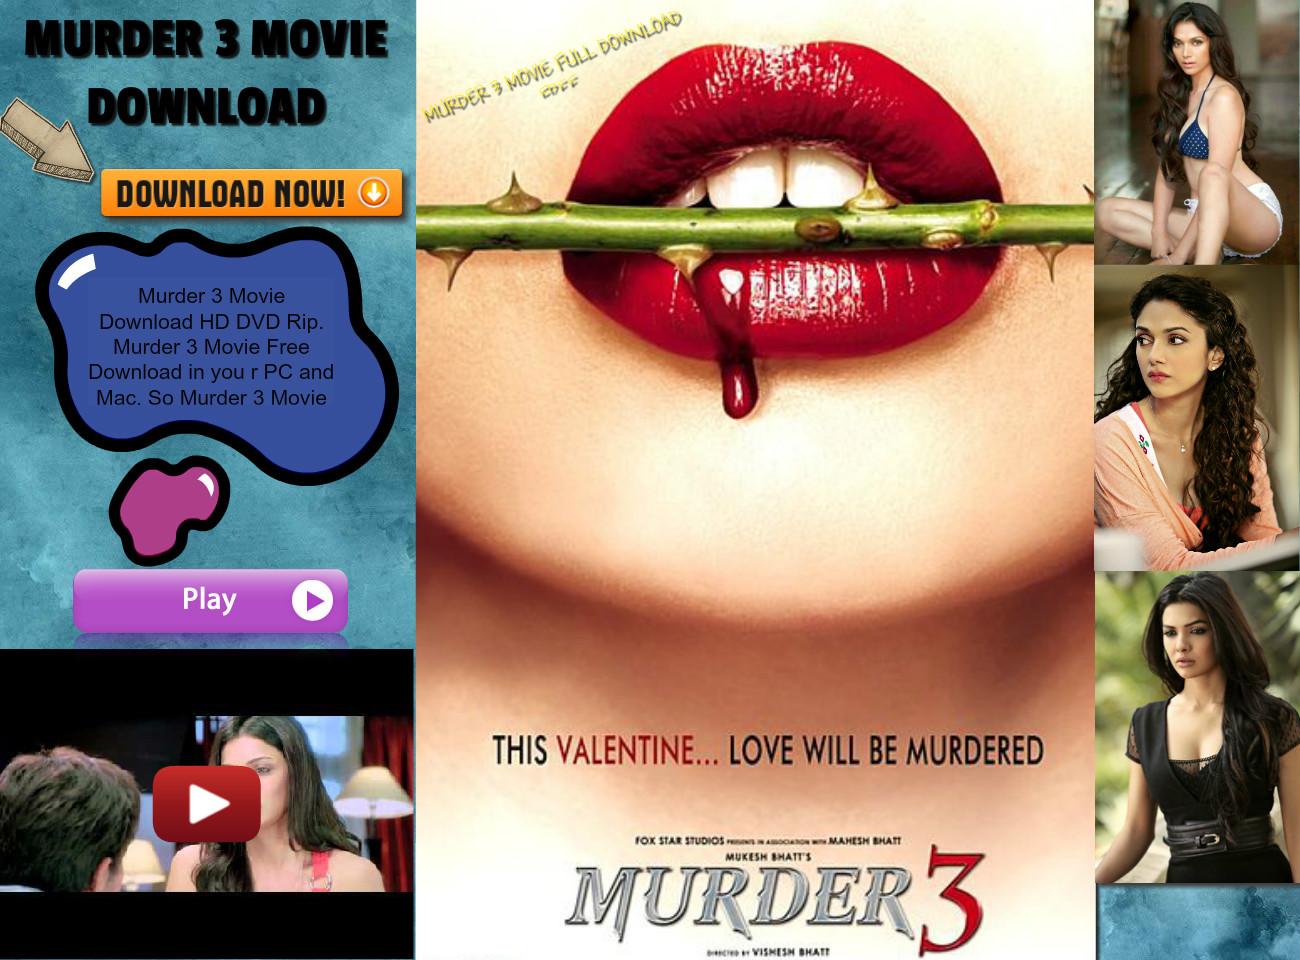 Song of murder movie